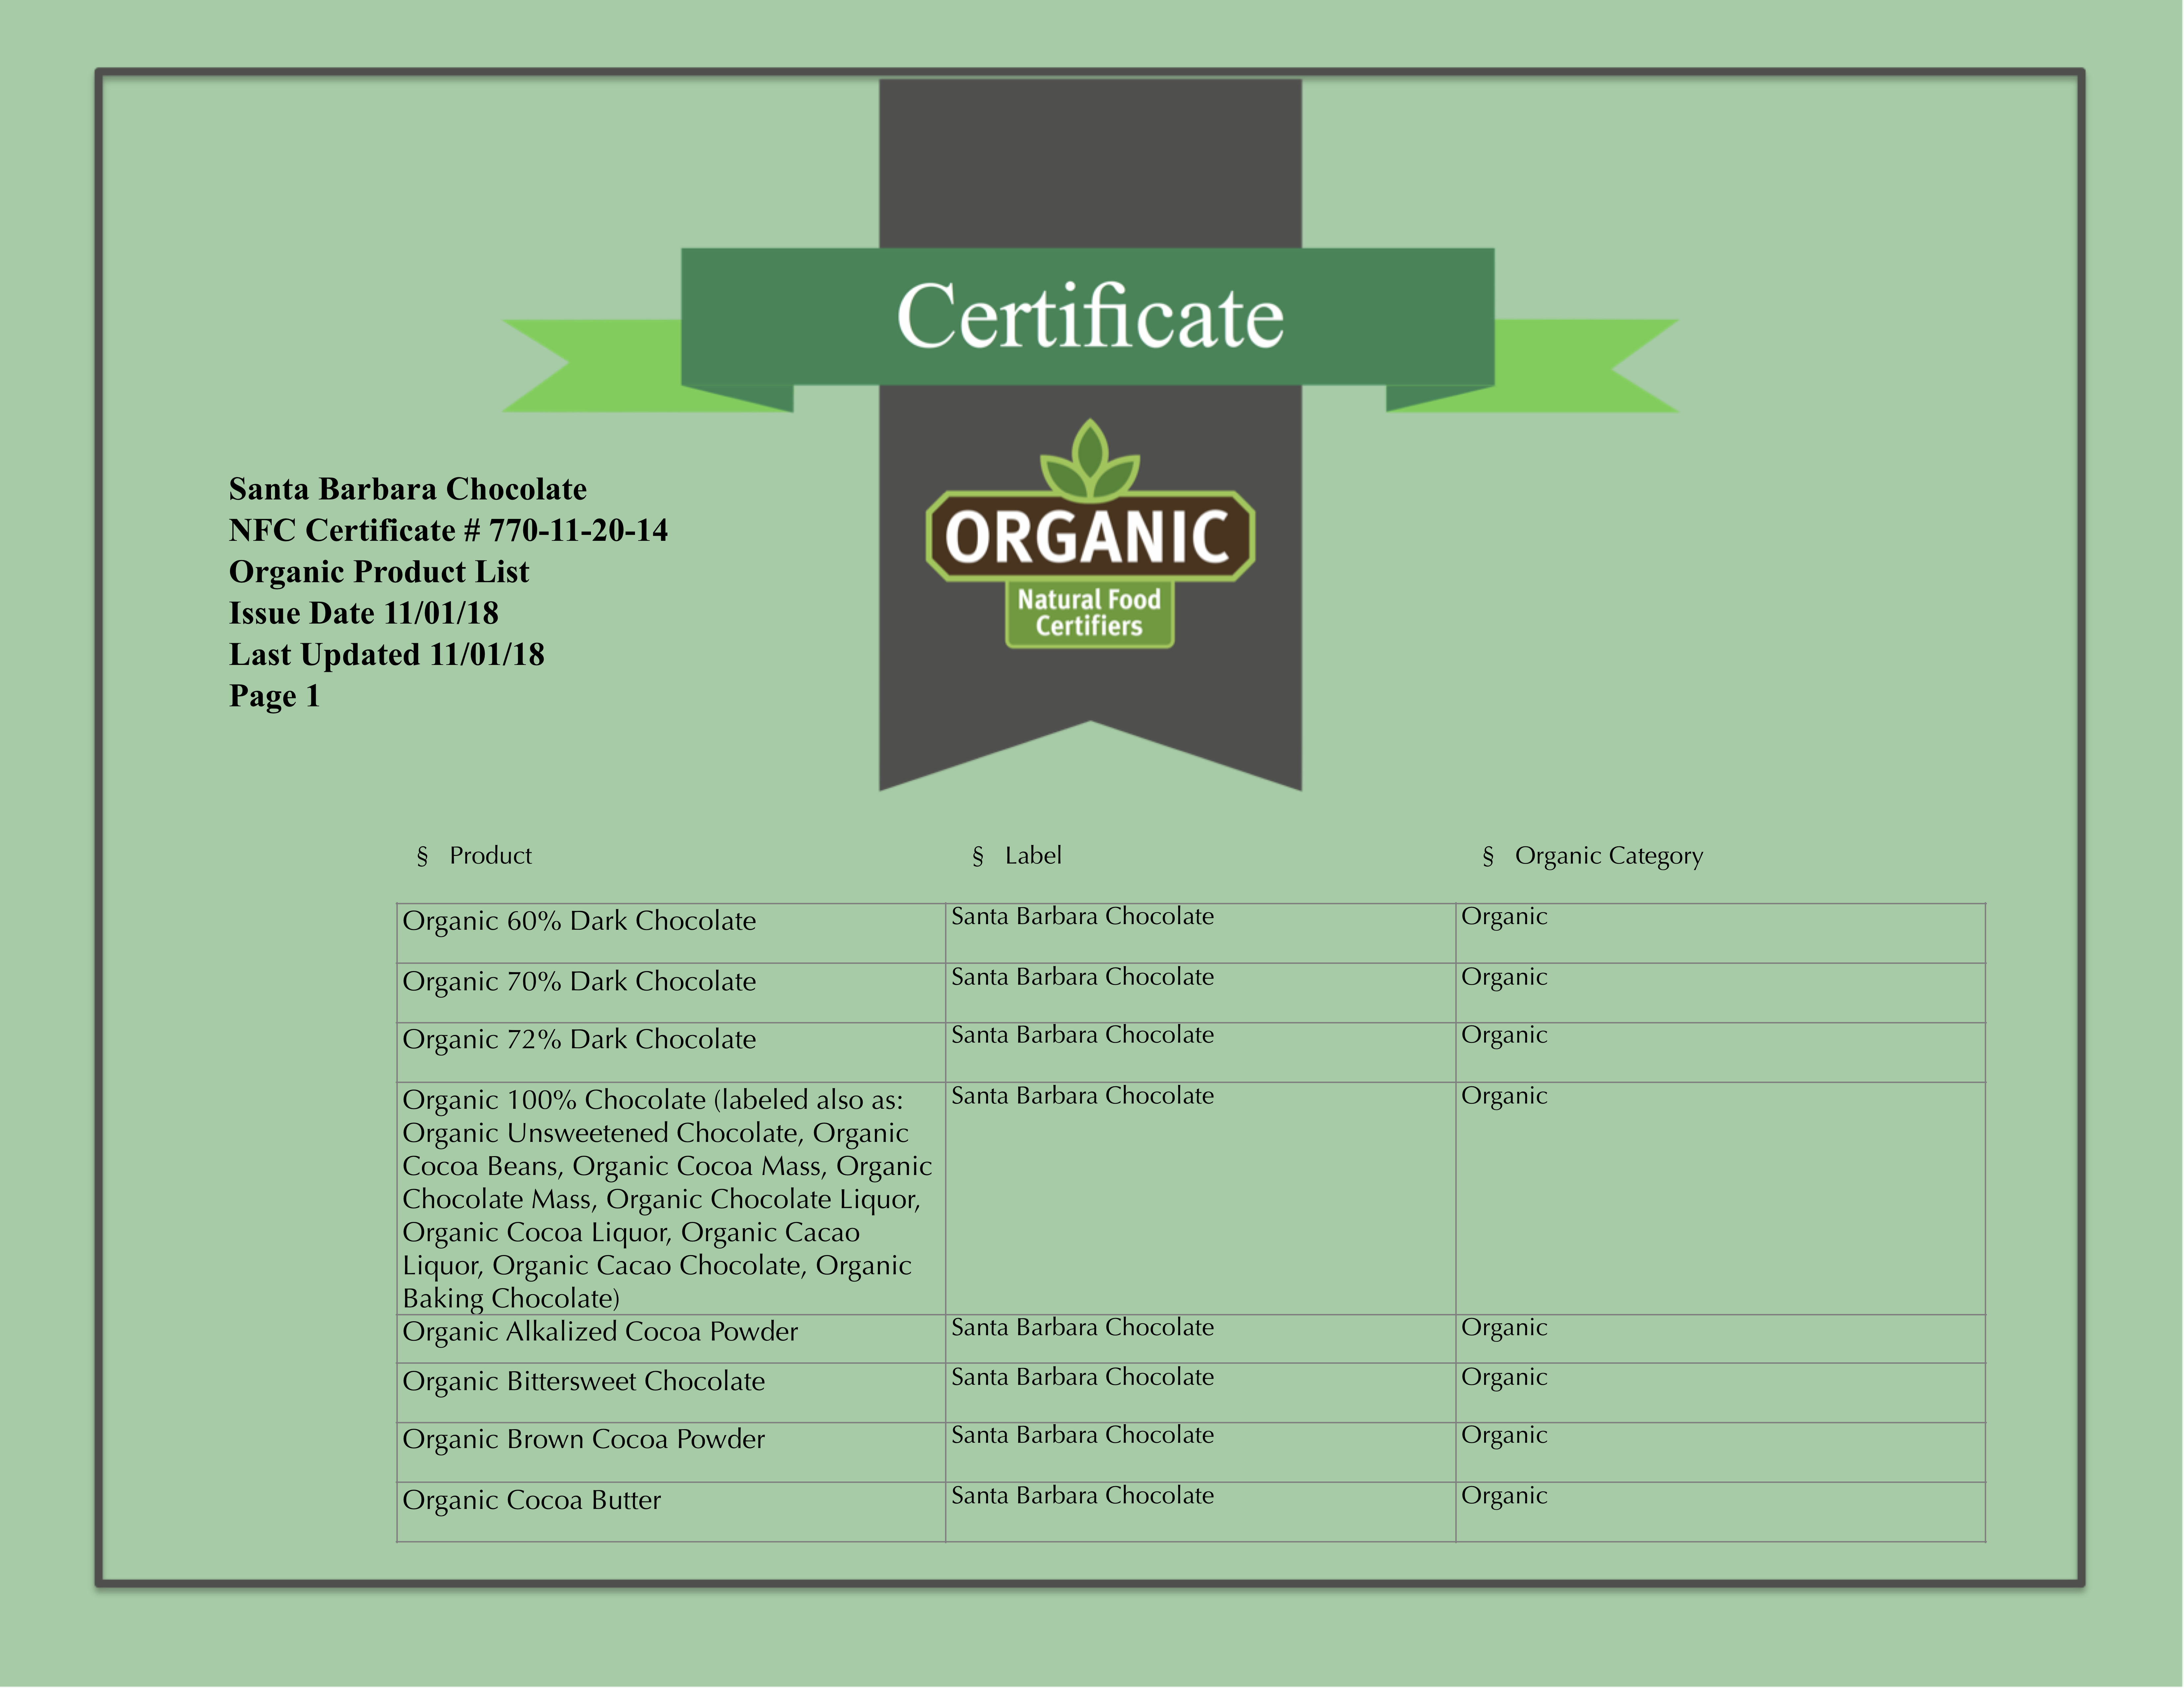 santa-barbara-chocolate-organic-certificate-2018-2019-page-2.jpg